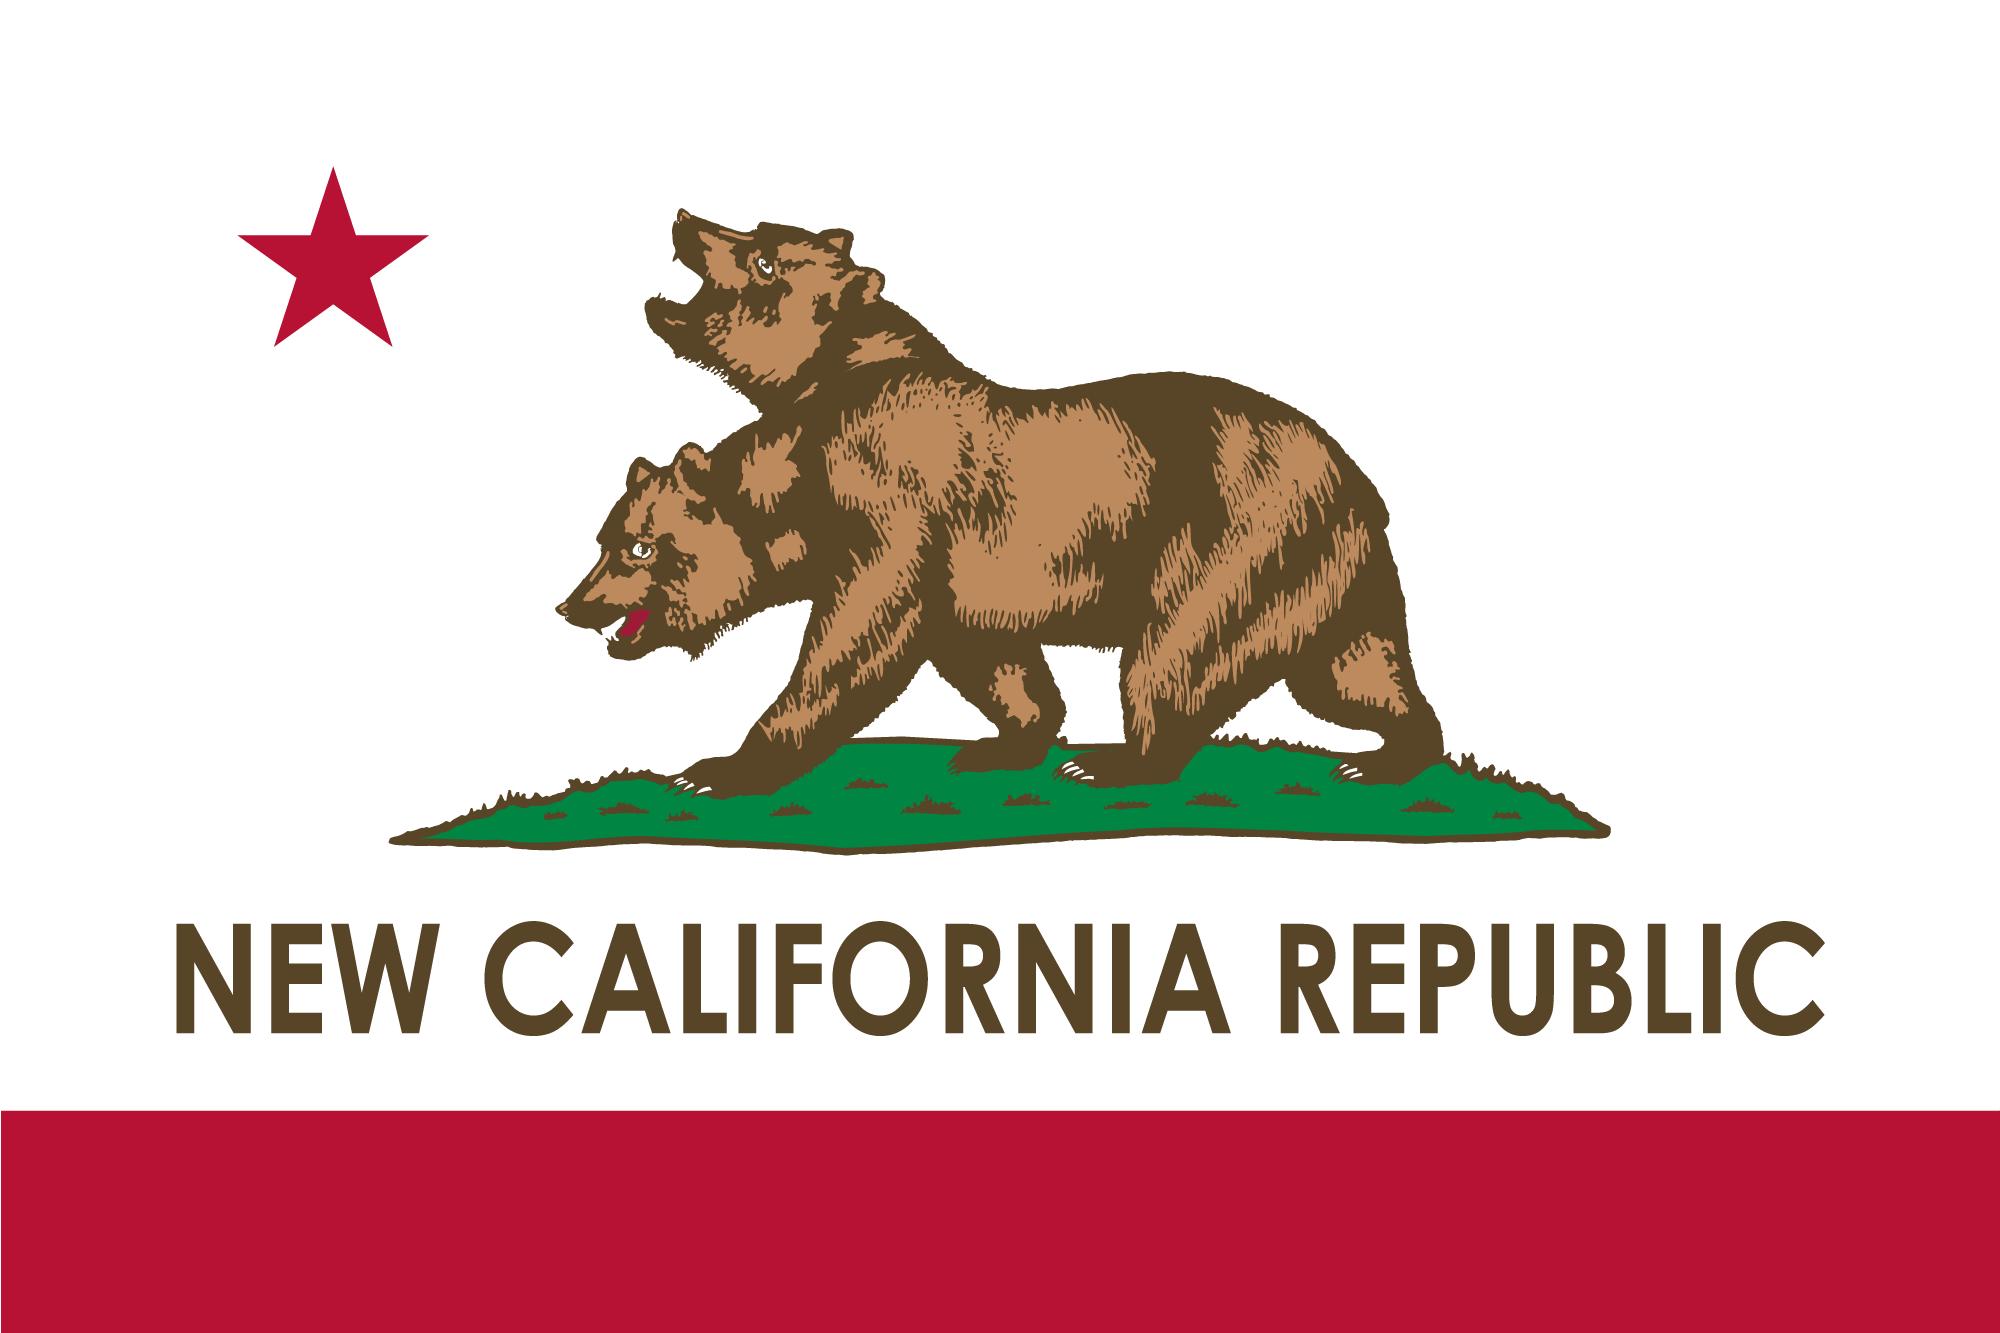 New California Republic   Fallout Wiki   FANDOM powered by Wikia